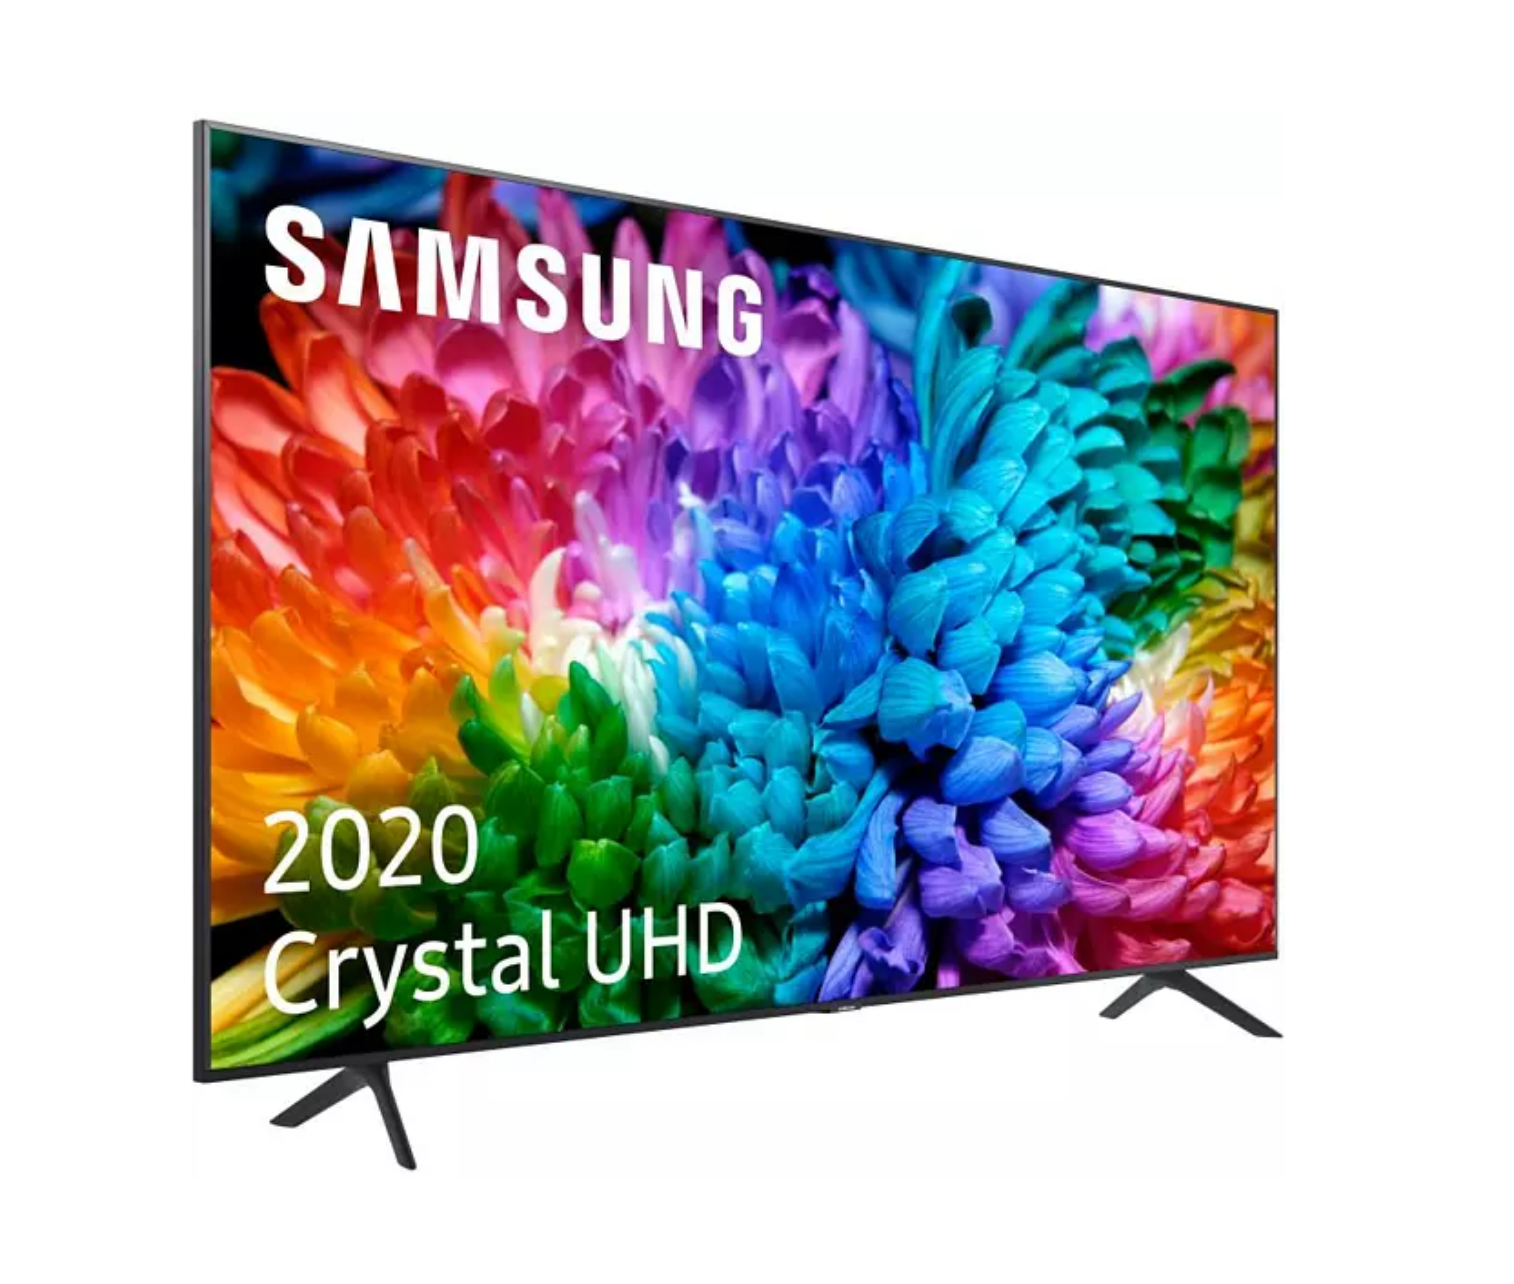 "TV LED 65"" - Samsung Crystal UHD 65TU7125, Smart TV, 4K Real y HDR10+, Compatible Asistentes de Voz, Tap View"